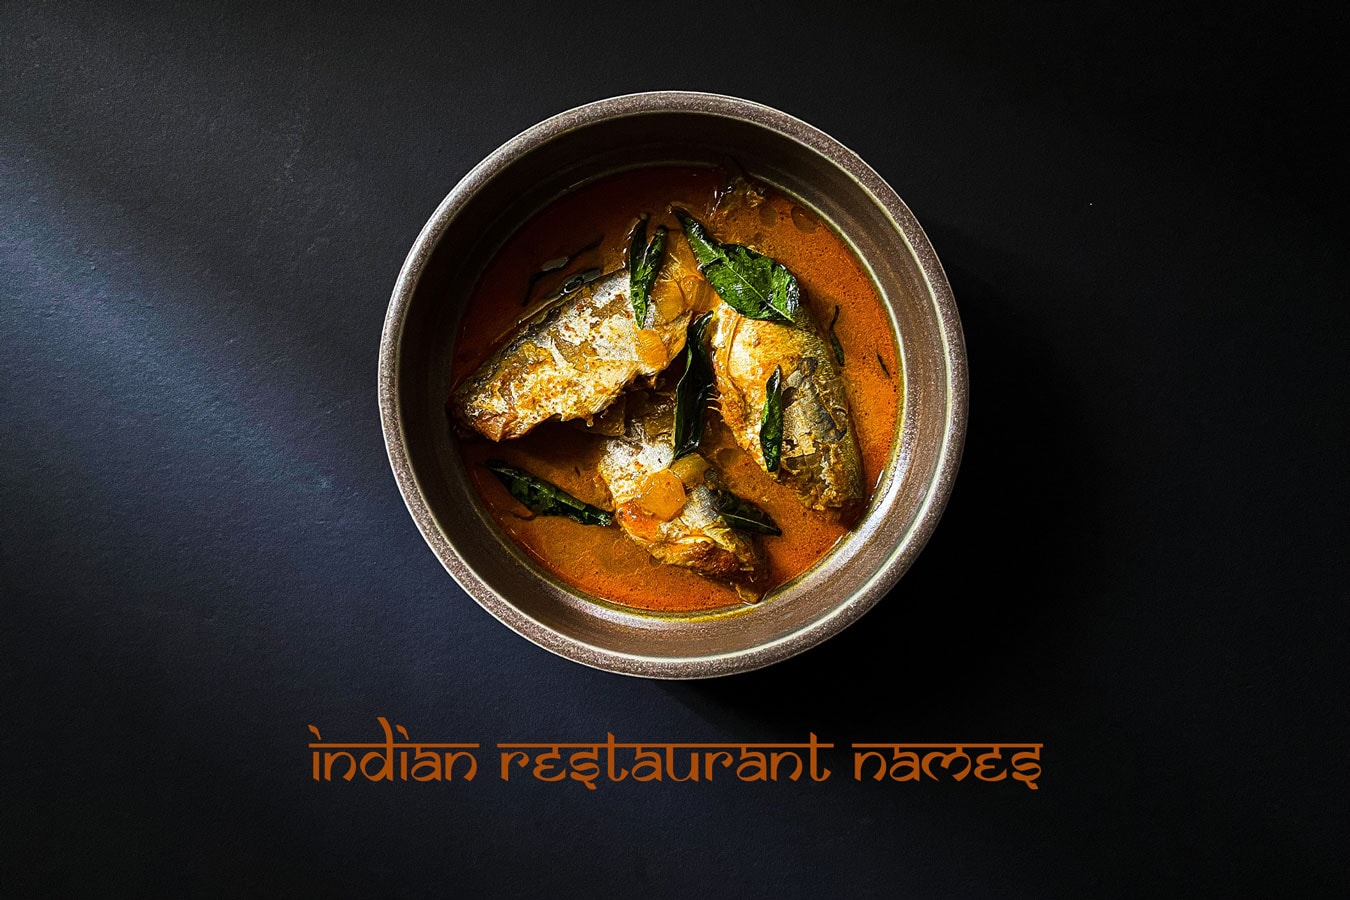 Indian restaurant names